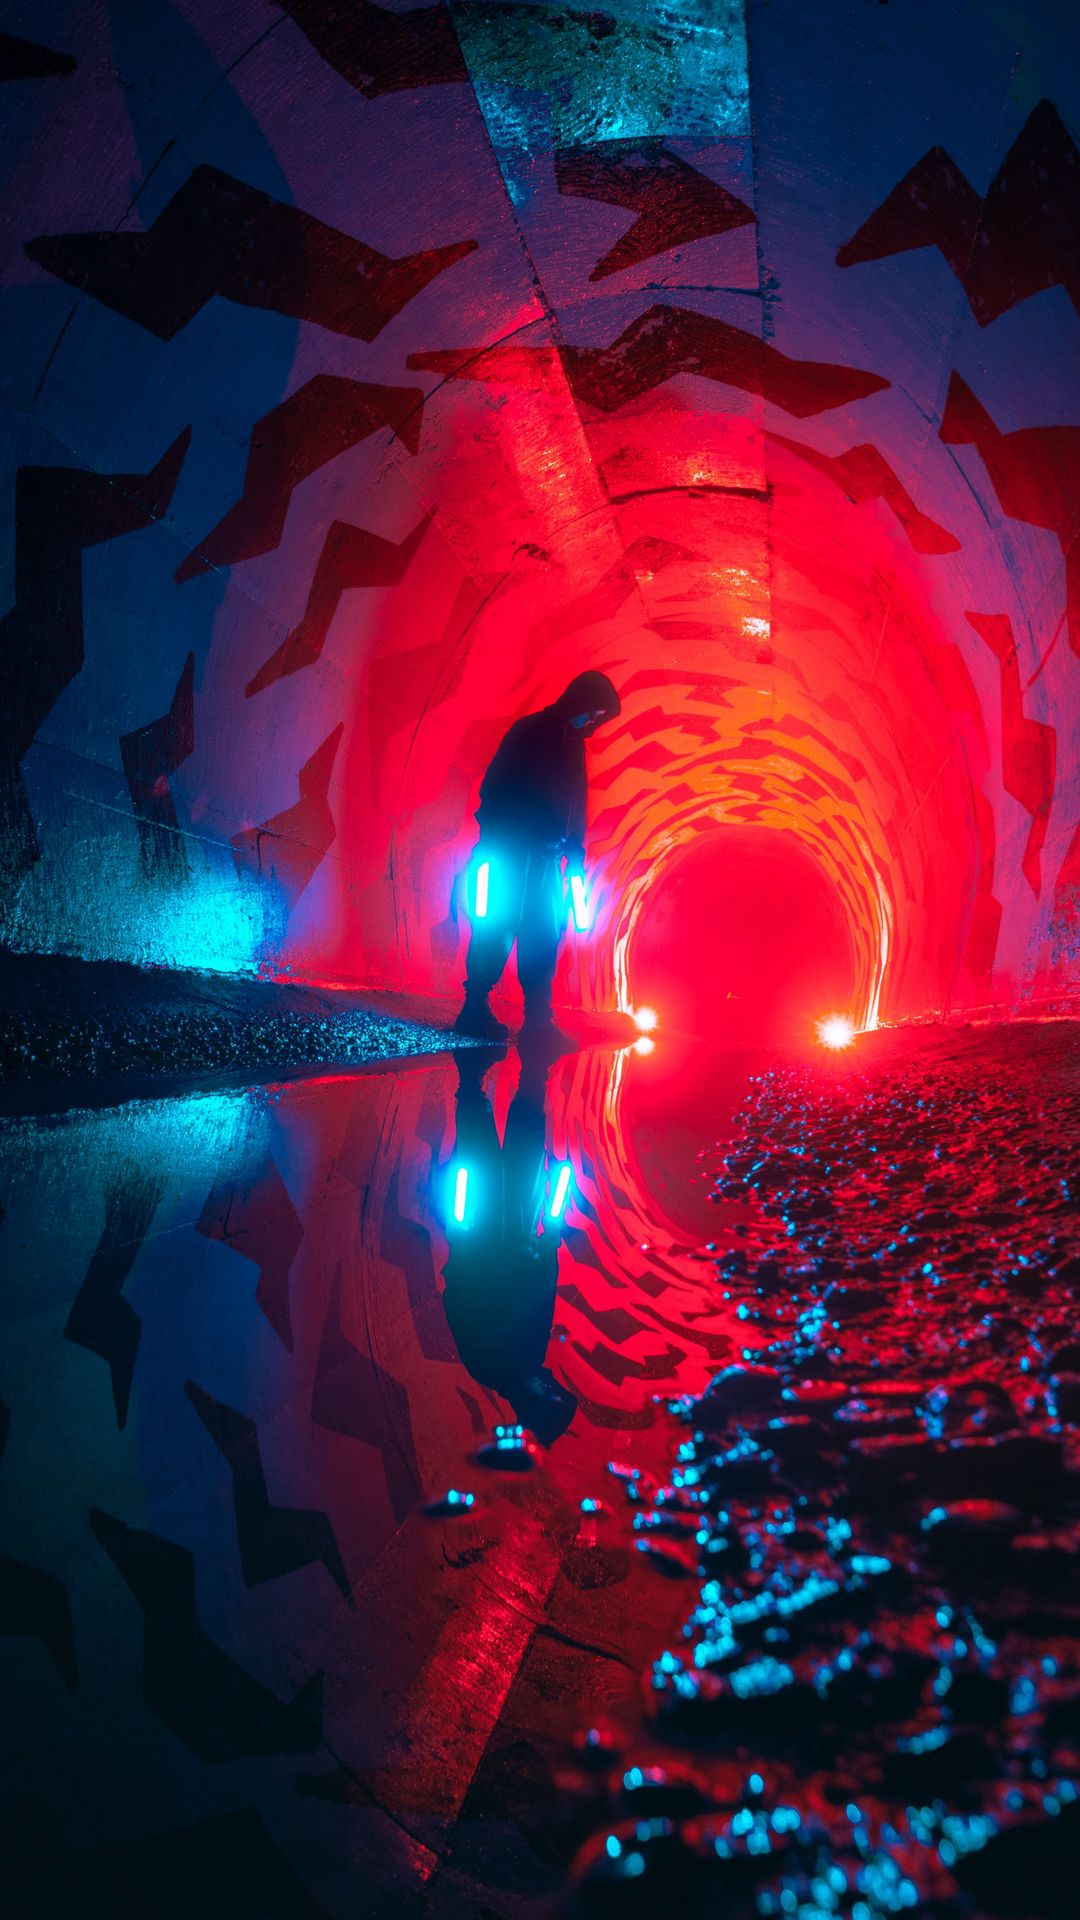 Hd Wallpaper Alone Man Tunnel Neon Light